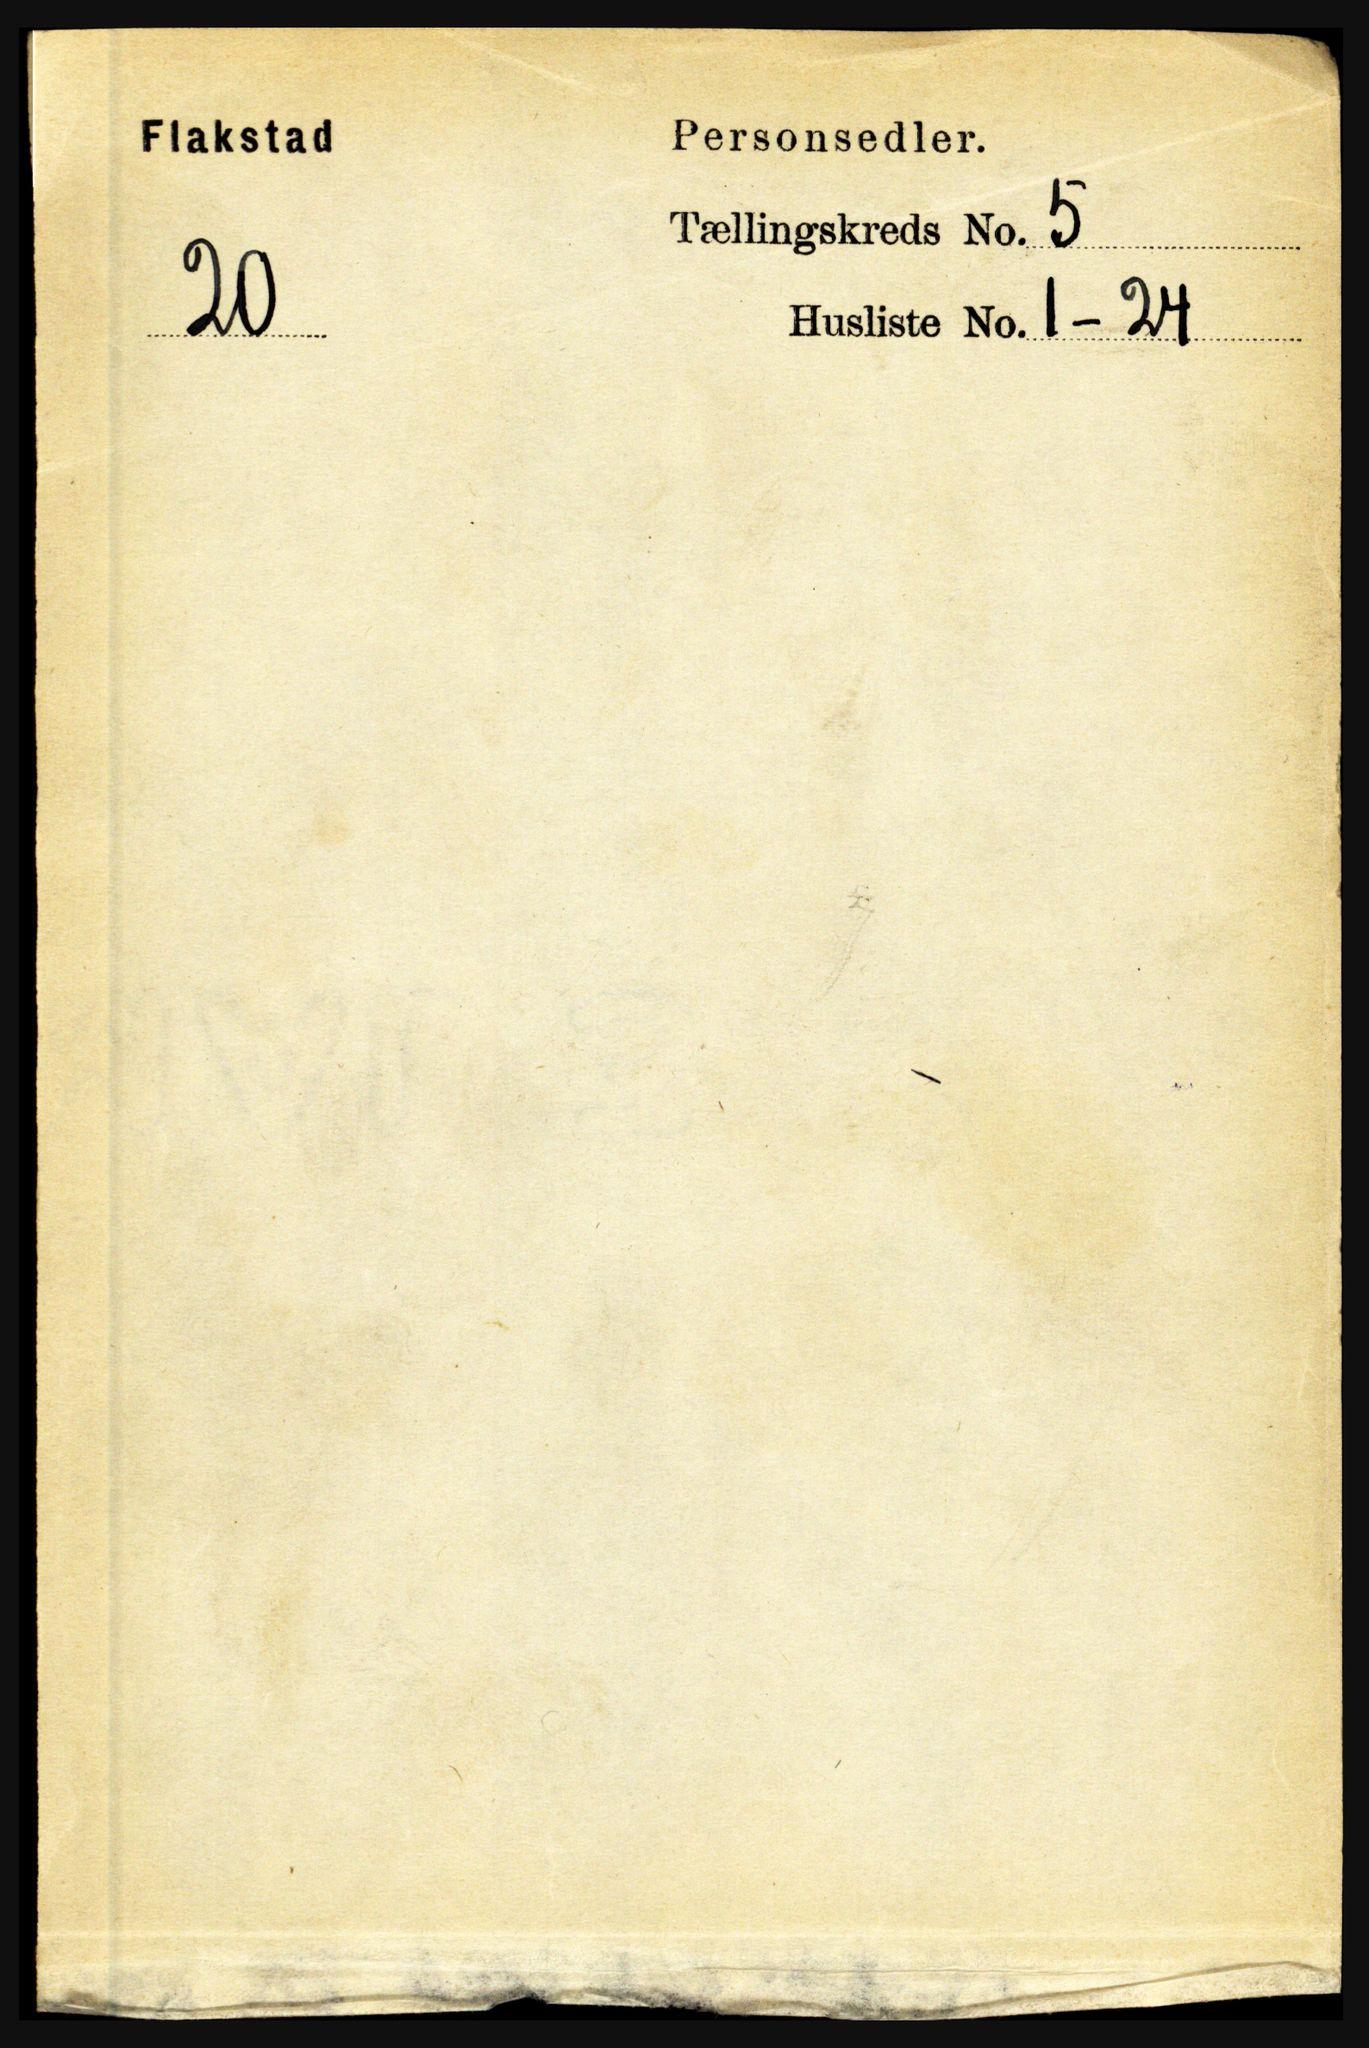 RA, Folketelling 1891 for 1859 Flakstad herred, 1891, s. 2471